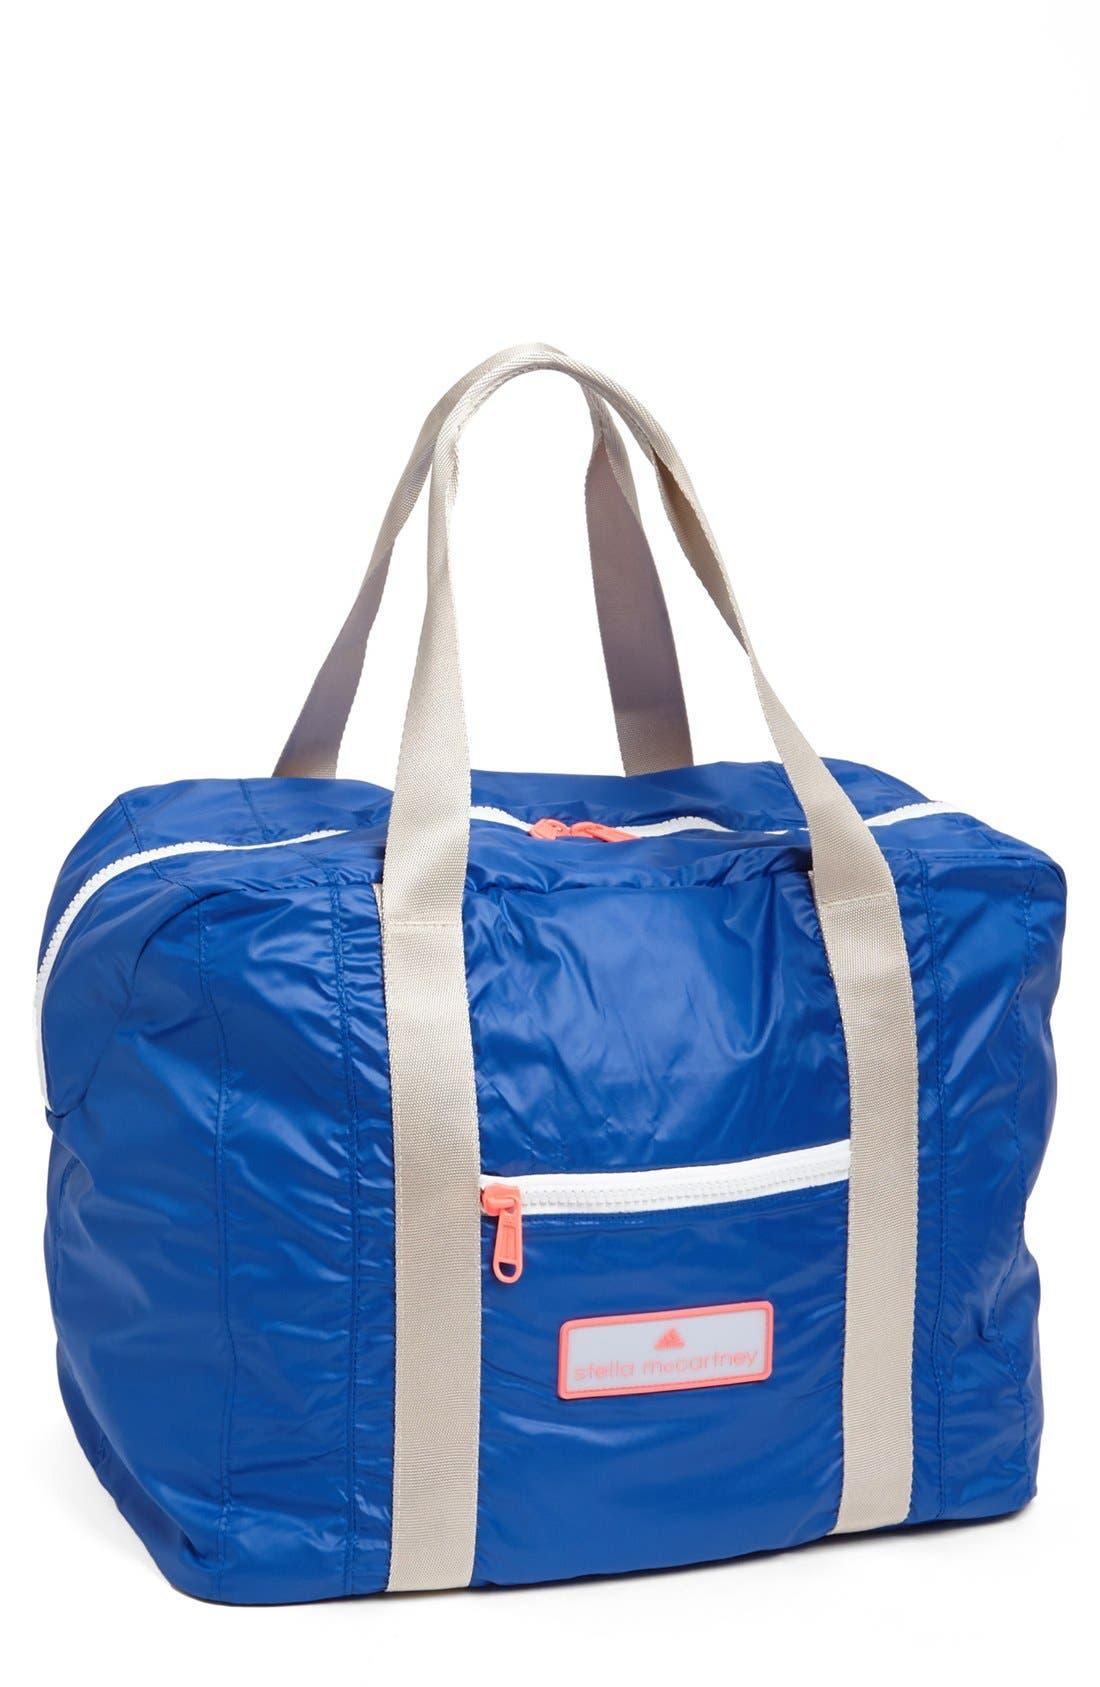 Main Image - adidas by Stella McCartney 'Big Carry On' Bag